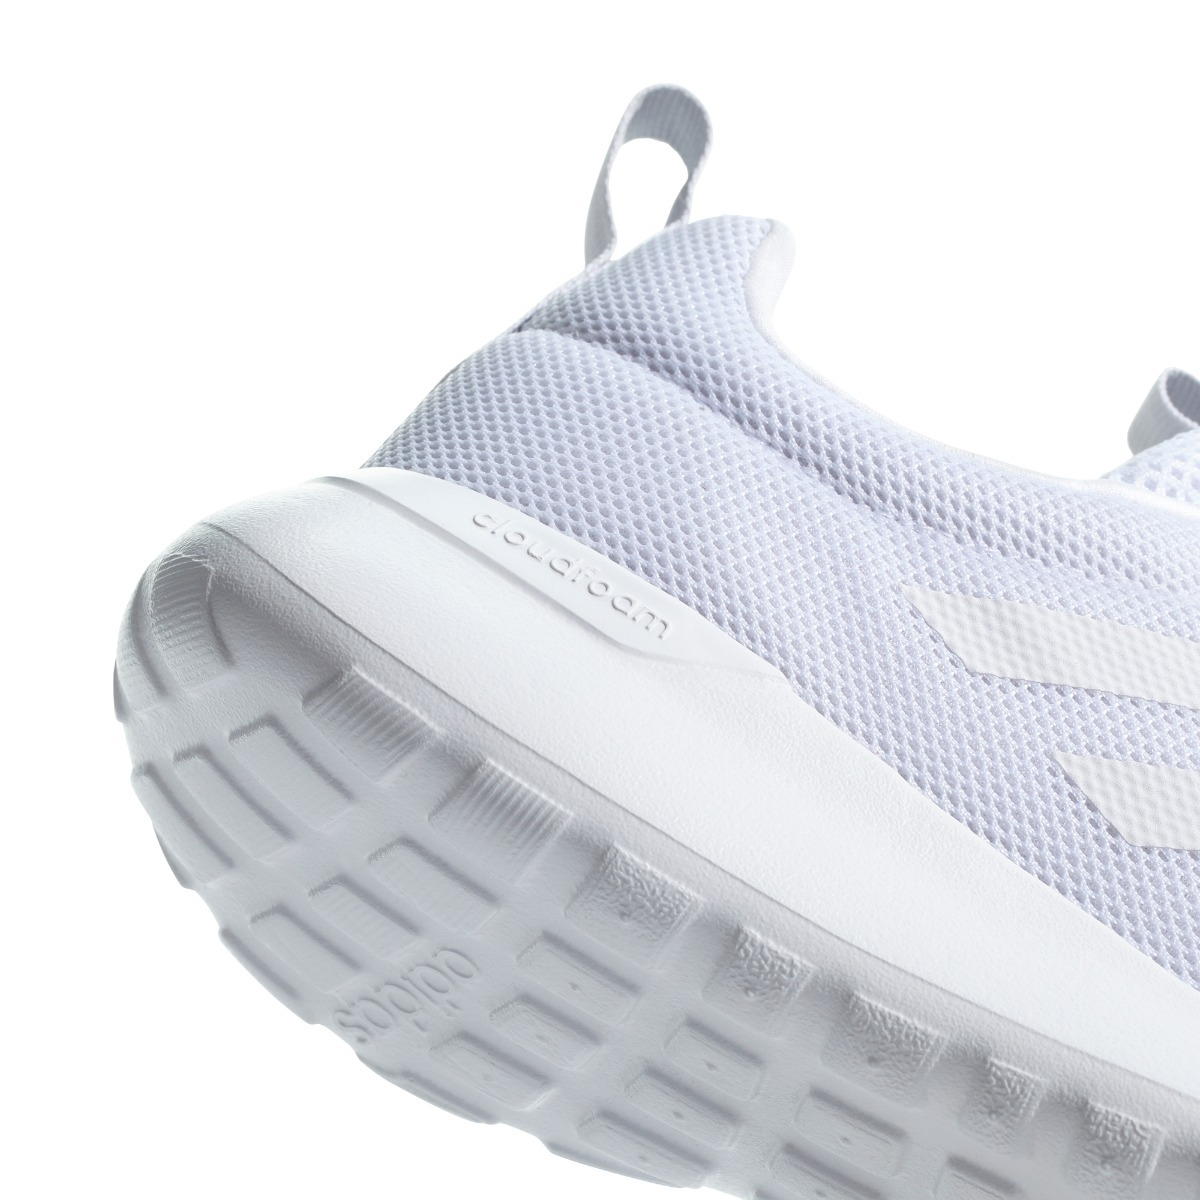 info for df5a8 690e7 championes adidas dama lite racer cln bb6895 - global sports. Cargando zoom.